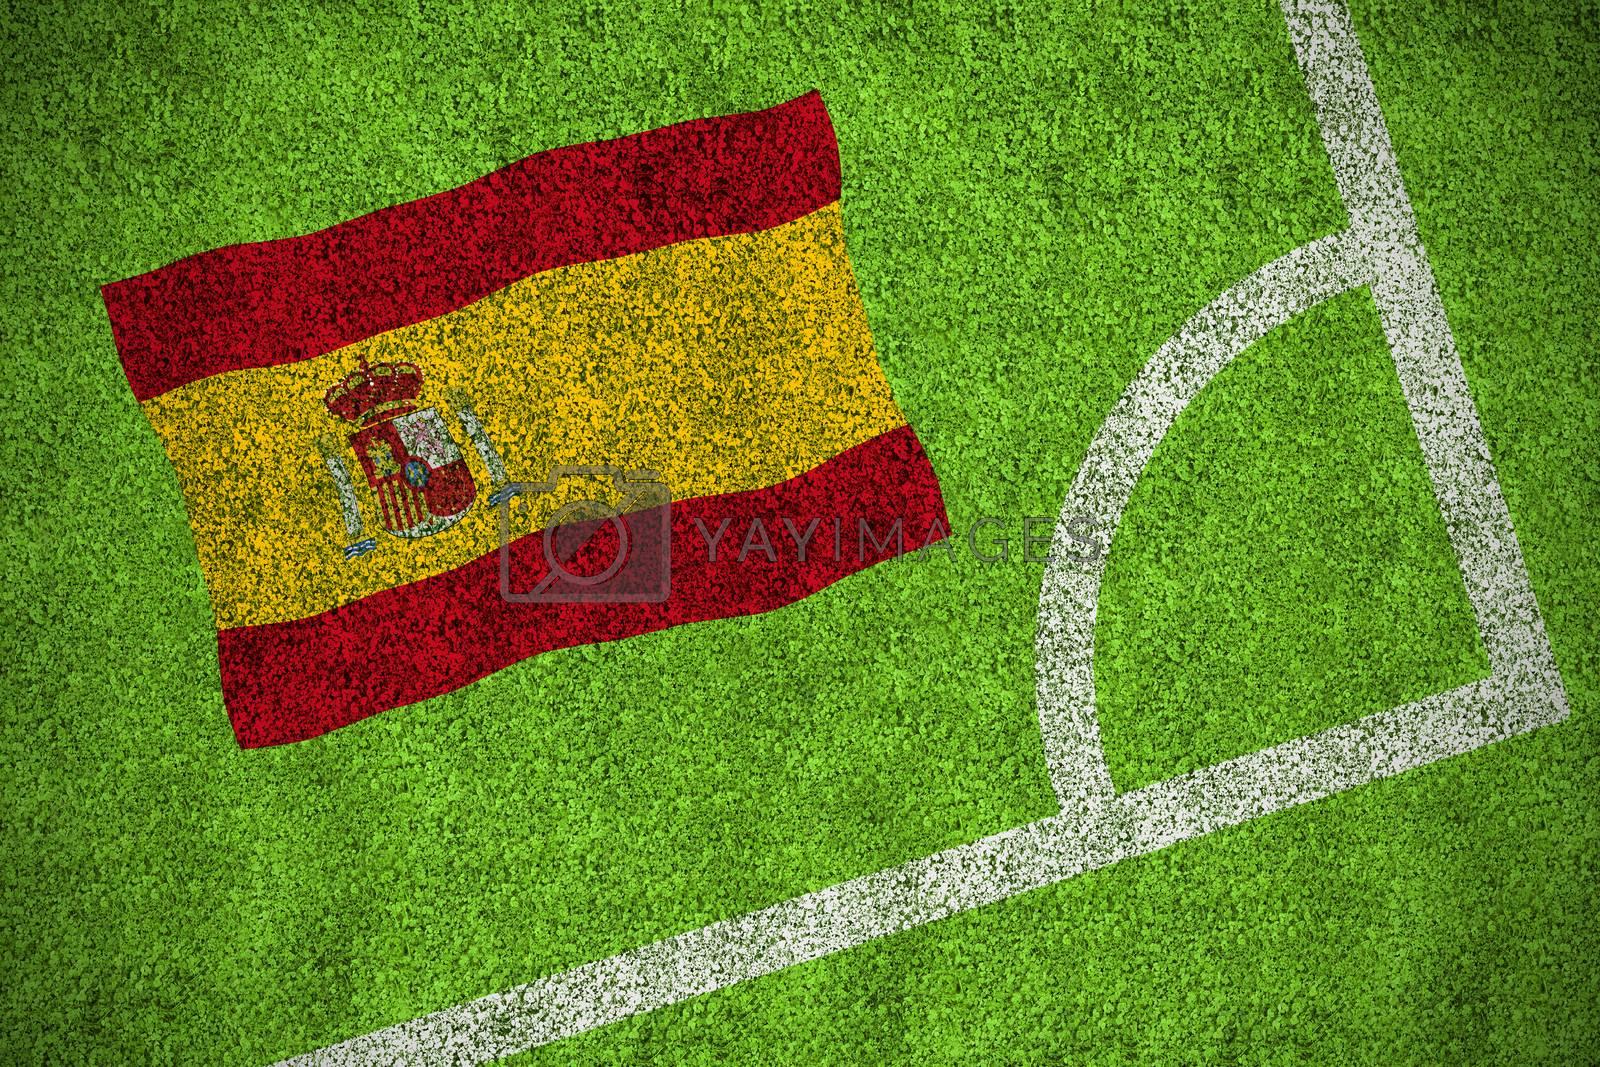 Spain national flag by Wavebreakmedia